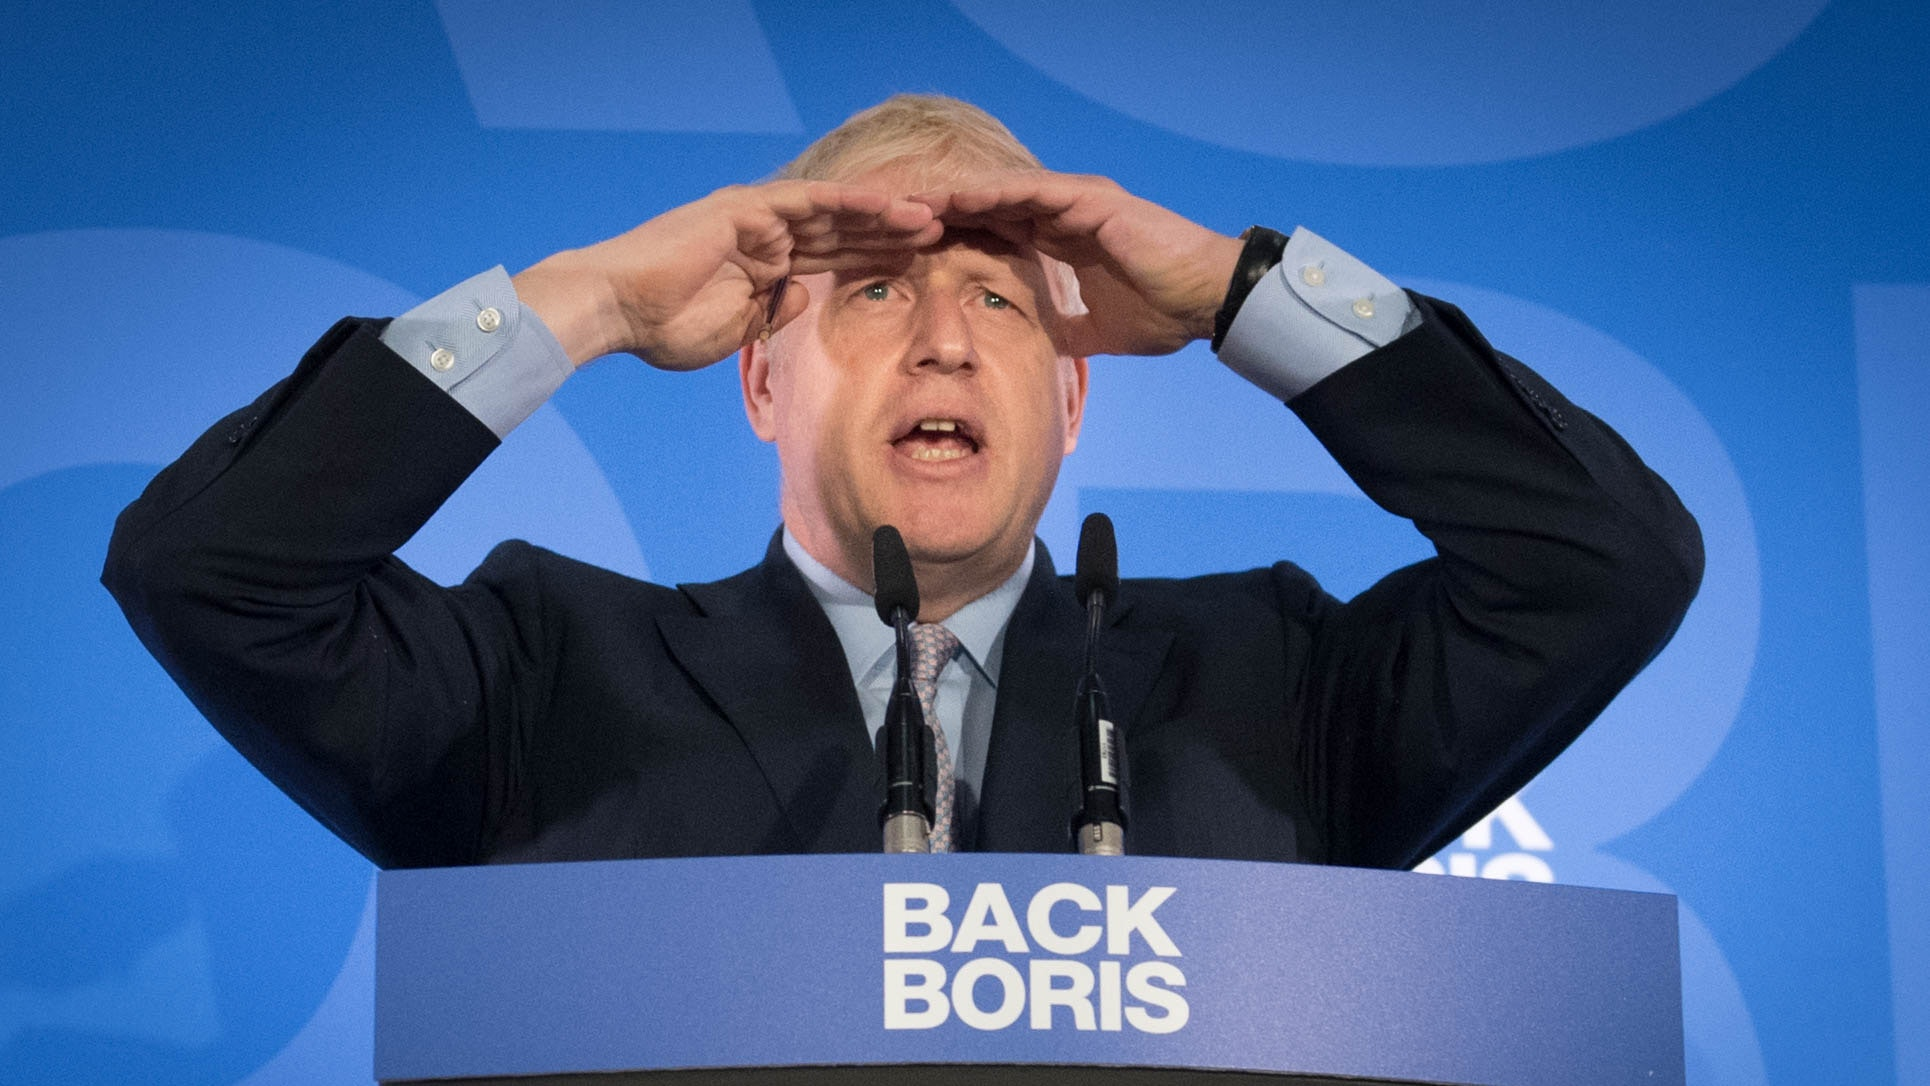 Lord Sugar backs Boris Johnson to stop 'horrible man Corbyn'